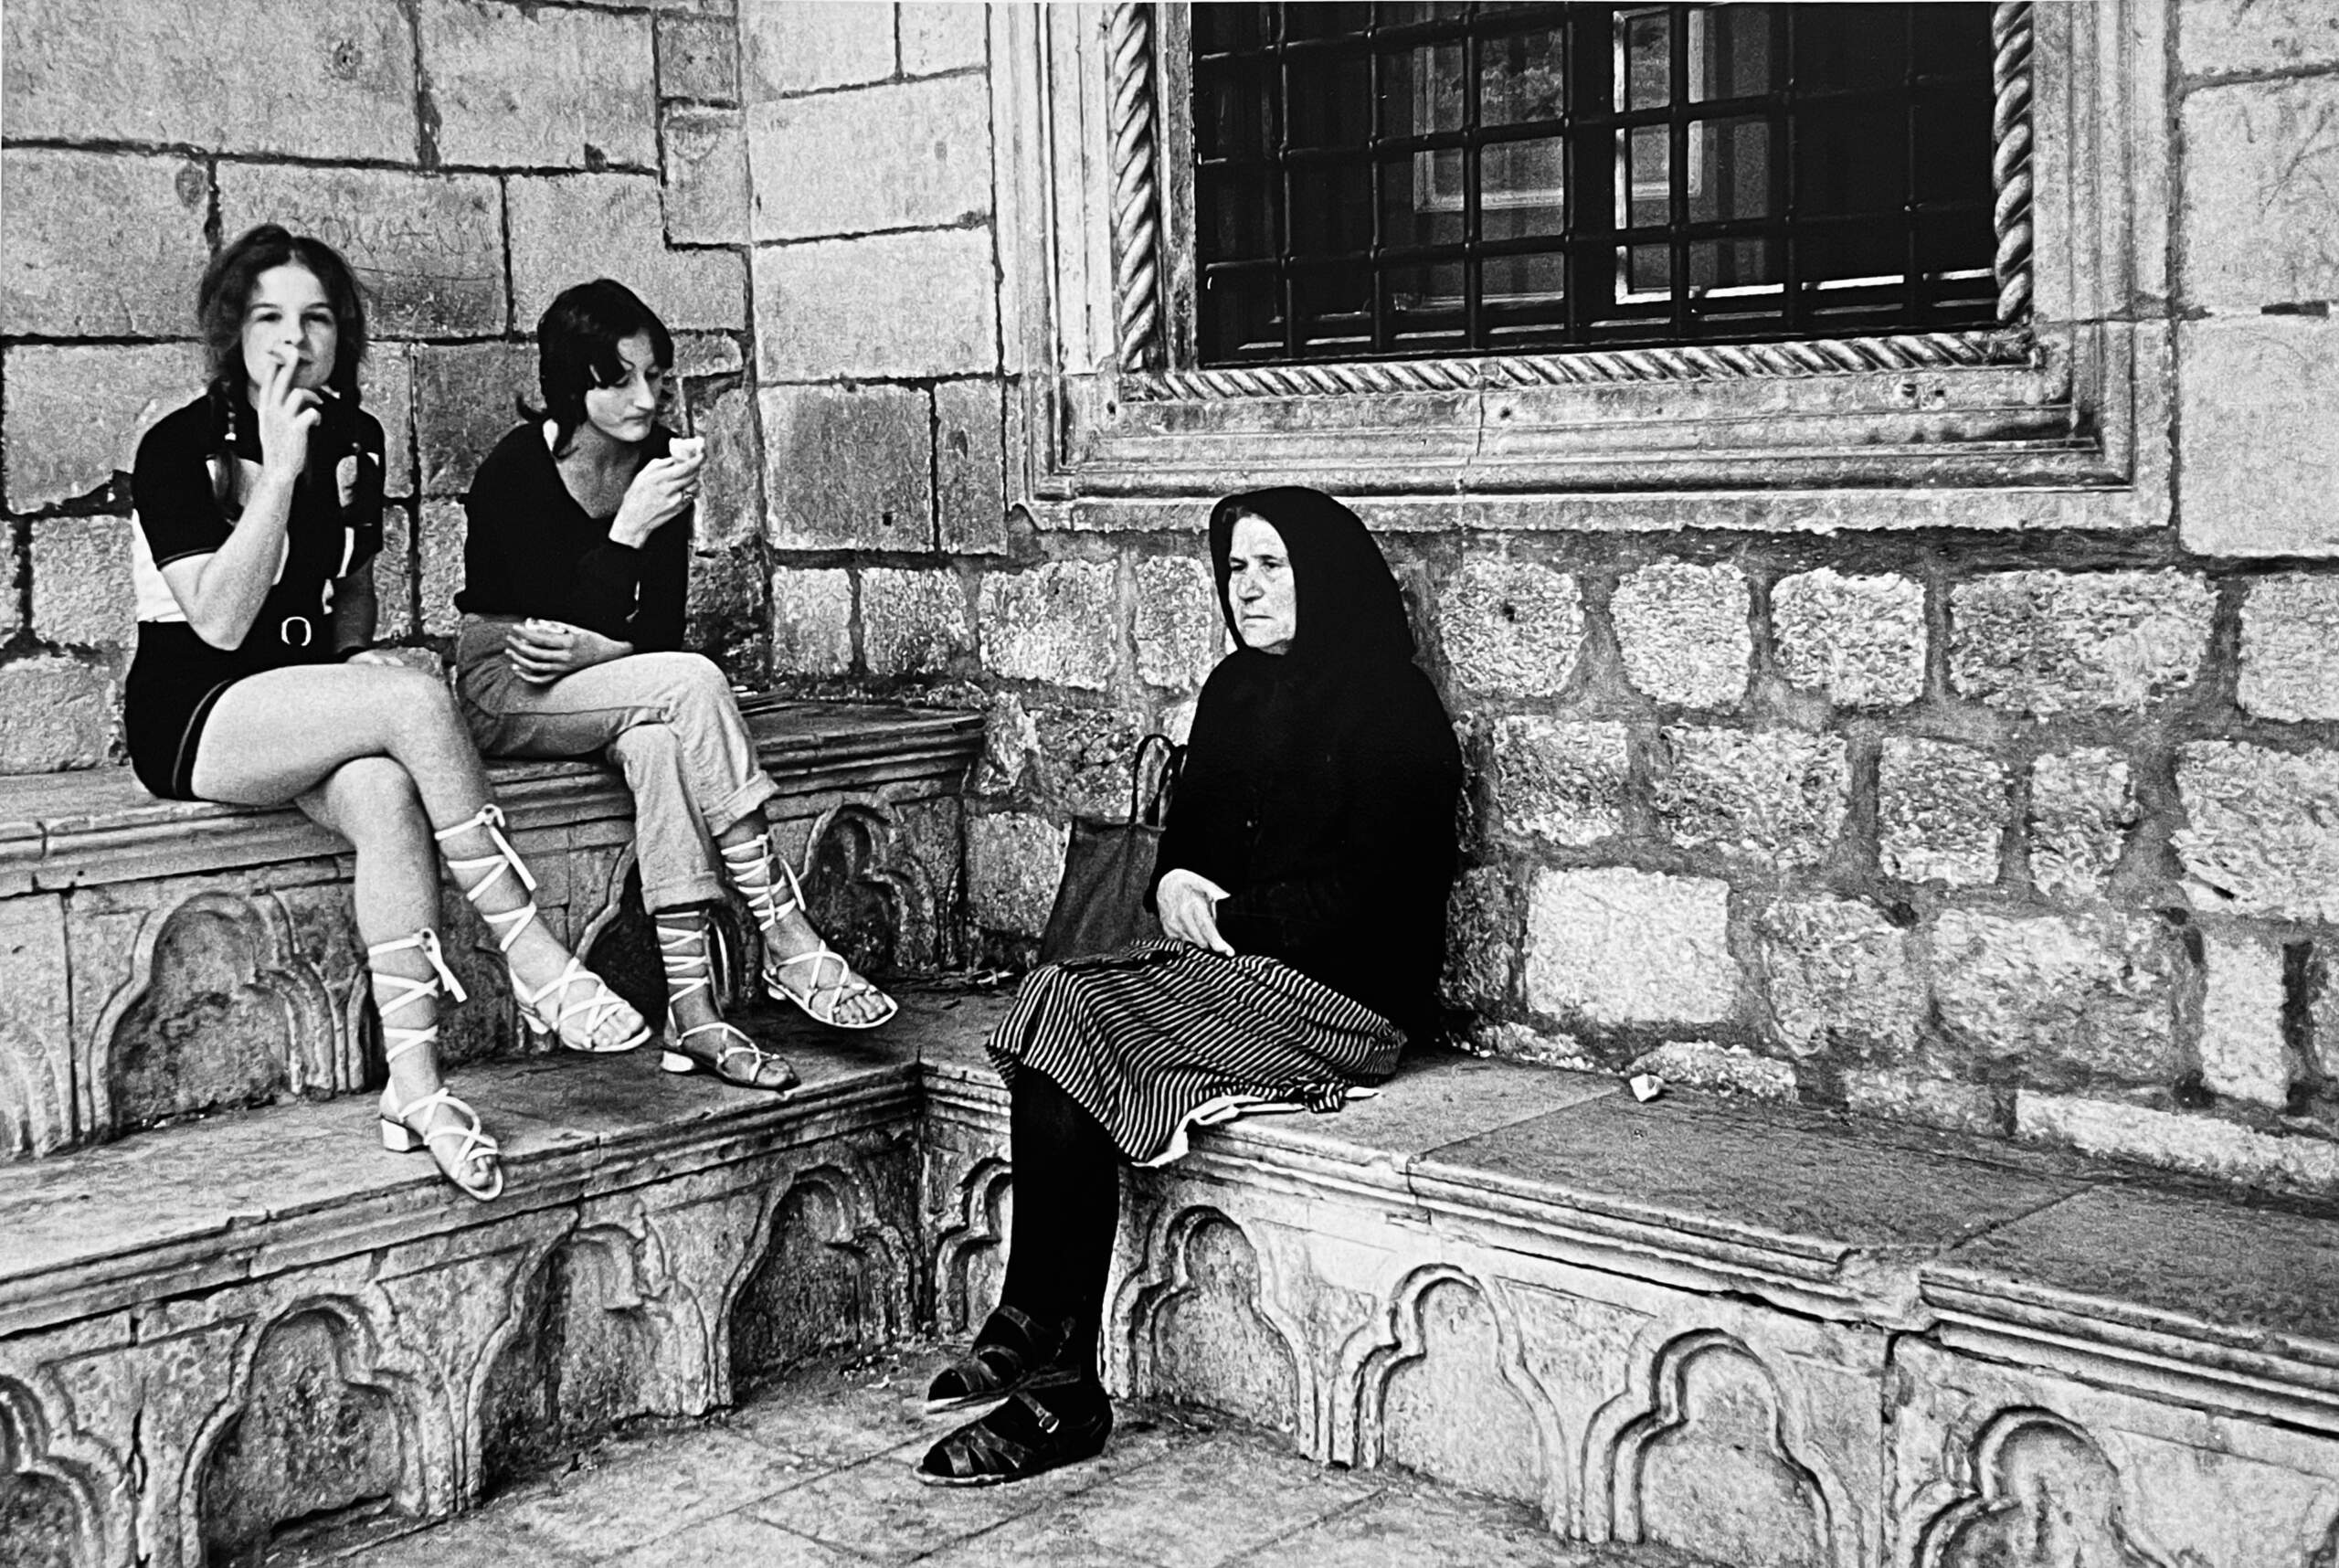 Branko Lenart, Only YU, Dubrovnik, 1971